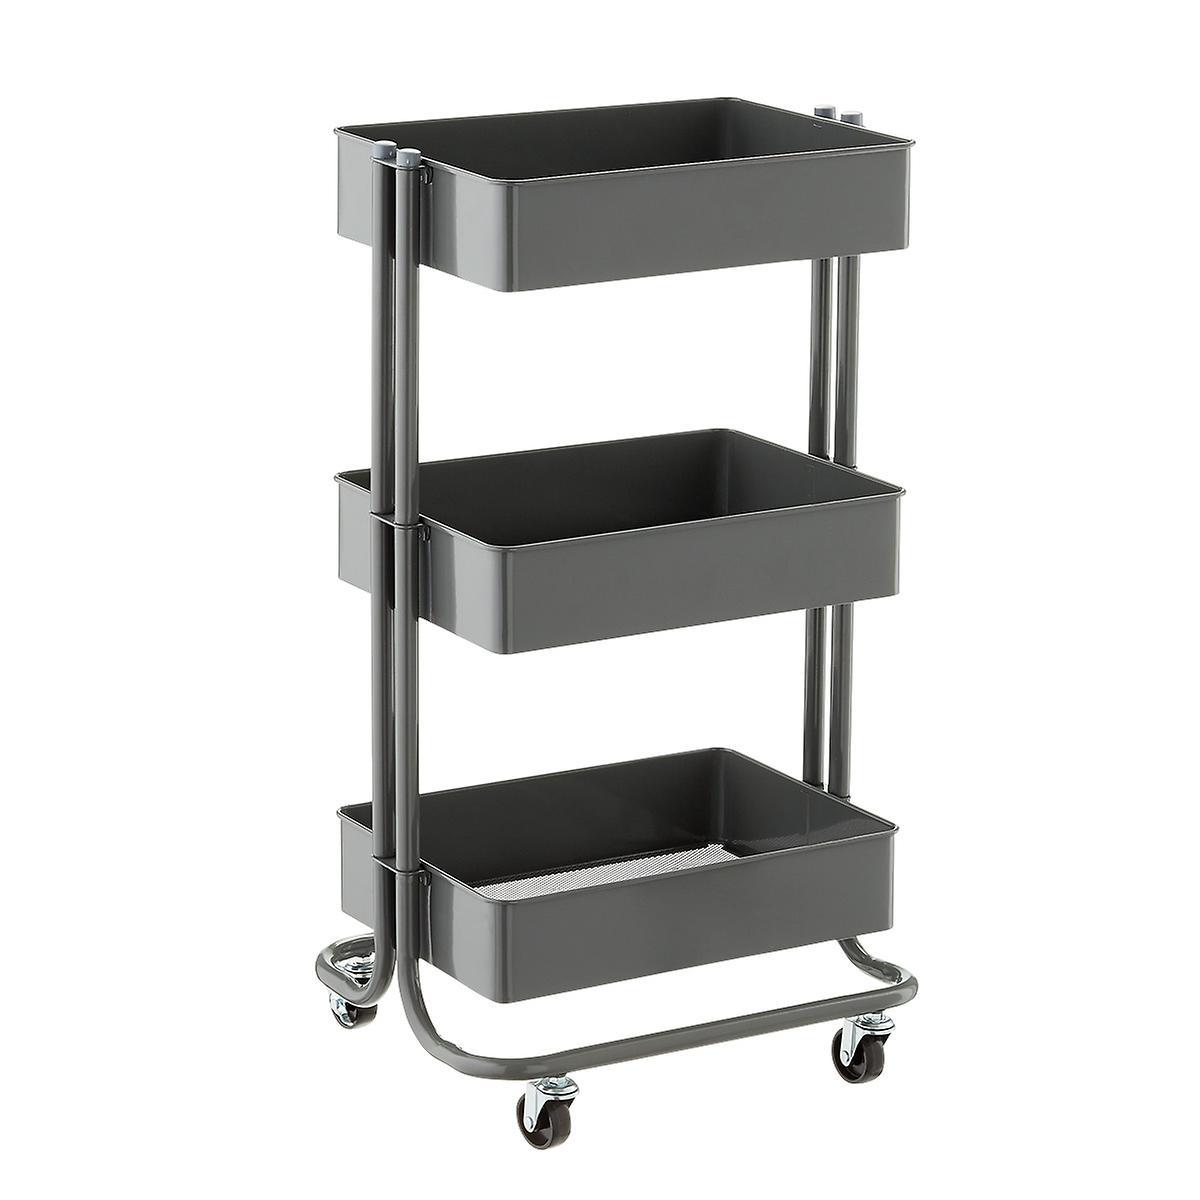 College Bath 3 Tier Rolling Cart Storage Solution